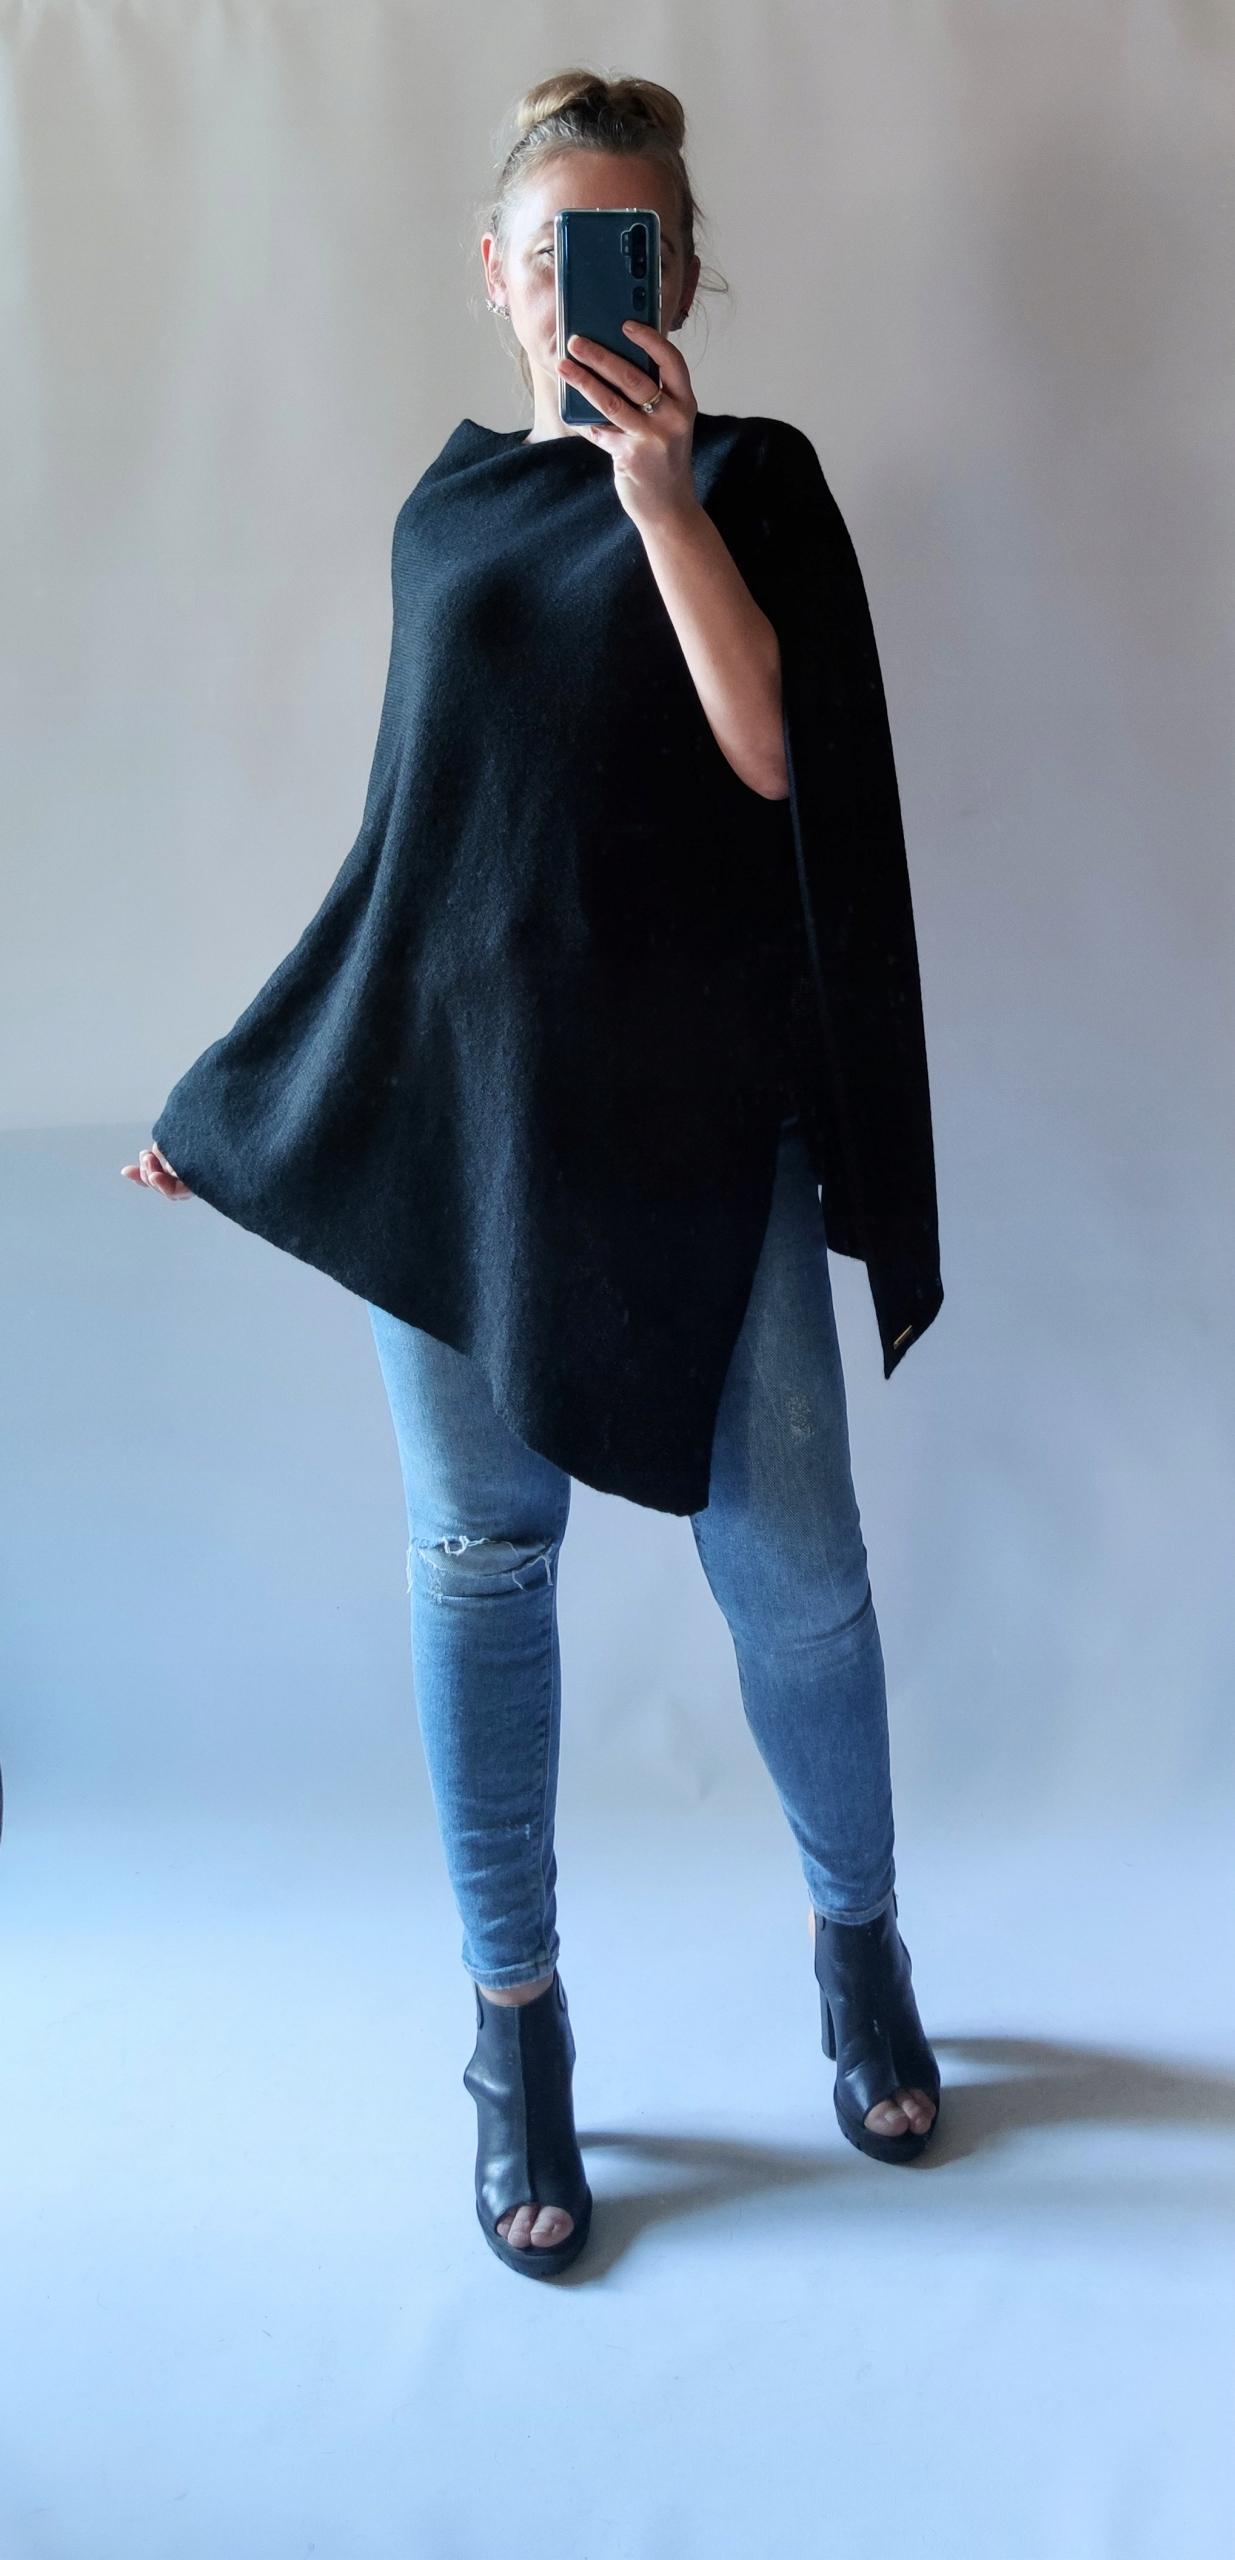 Ponczo,narzutka,sweter. 8544652042 - Allegro.pl